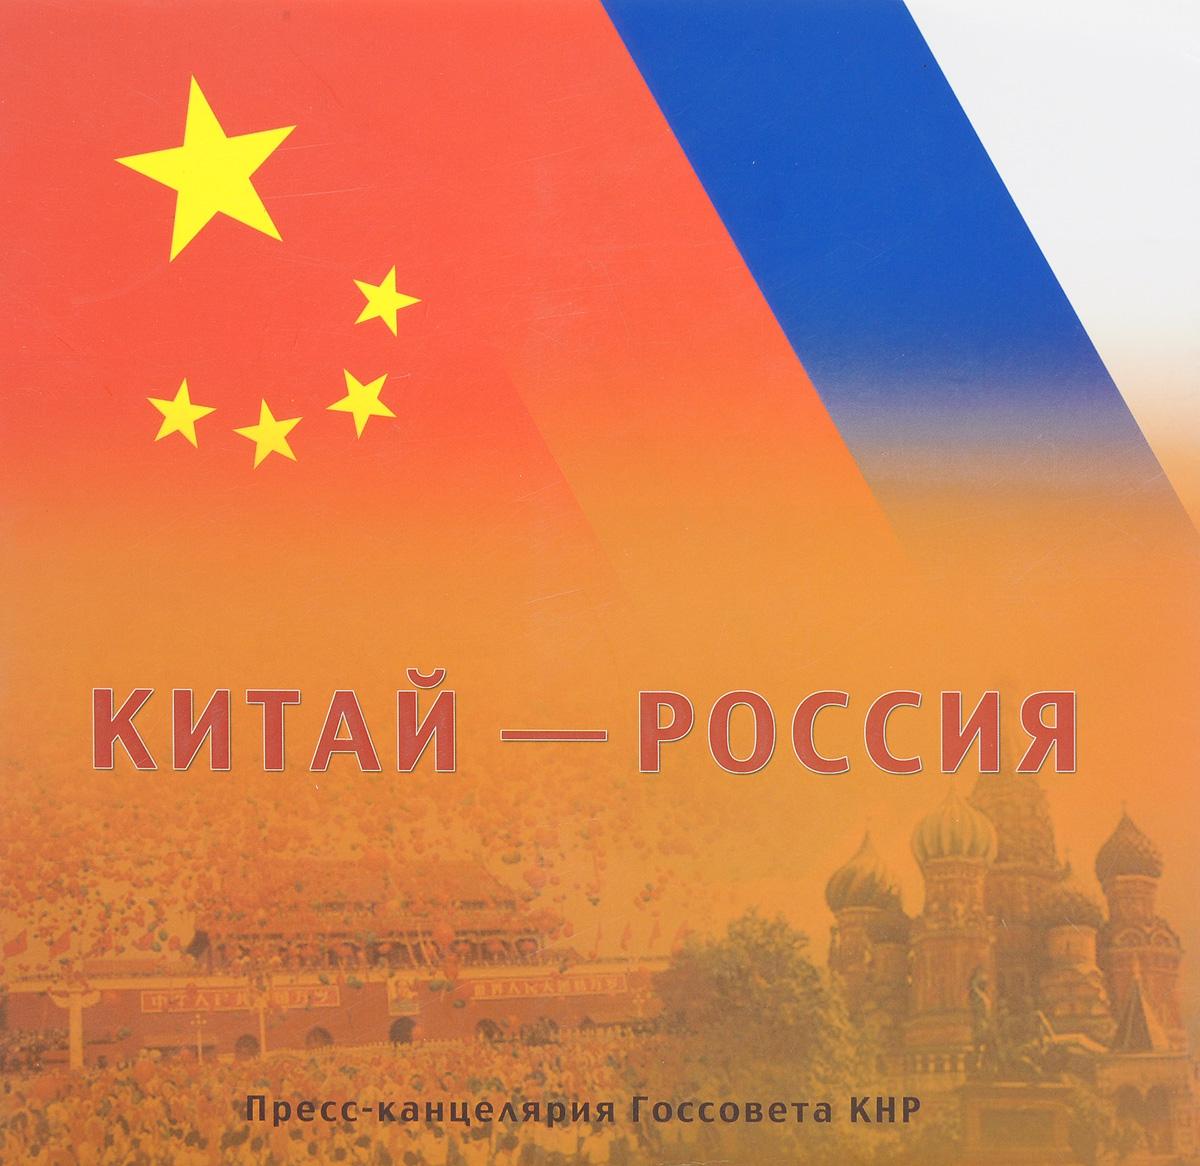 канцелярия Цзюй Мэнцзюнь Китай - Россия. Пресс-канцелярия Госсовета КНР